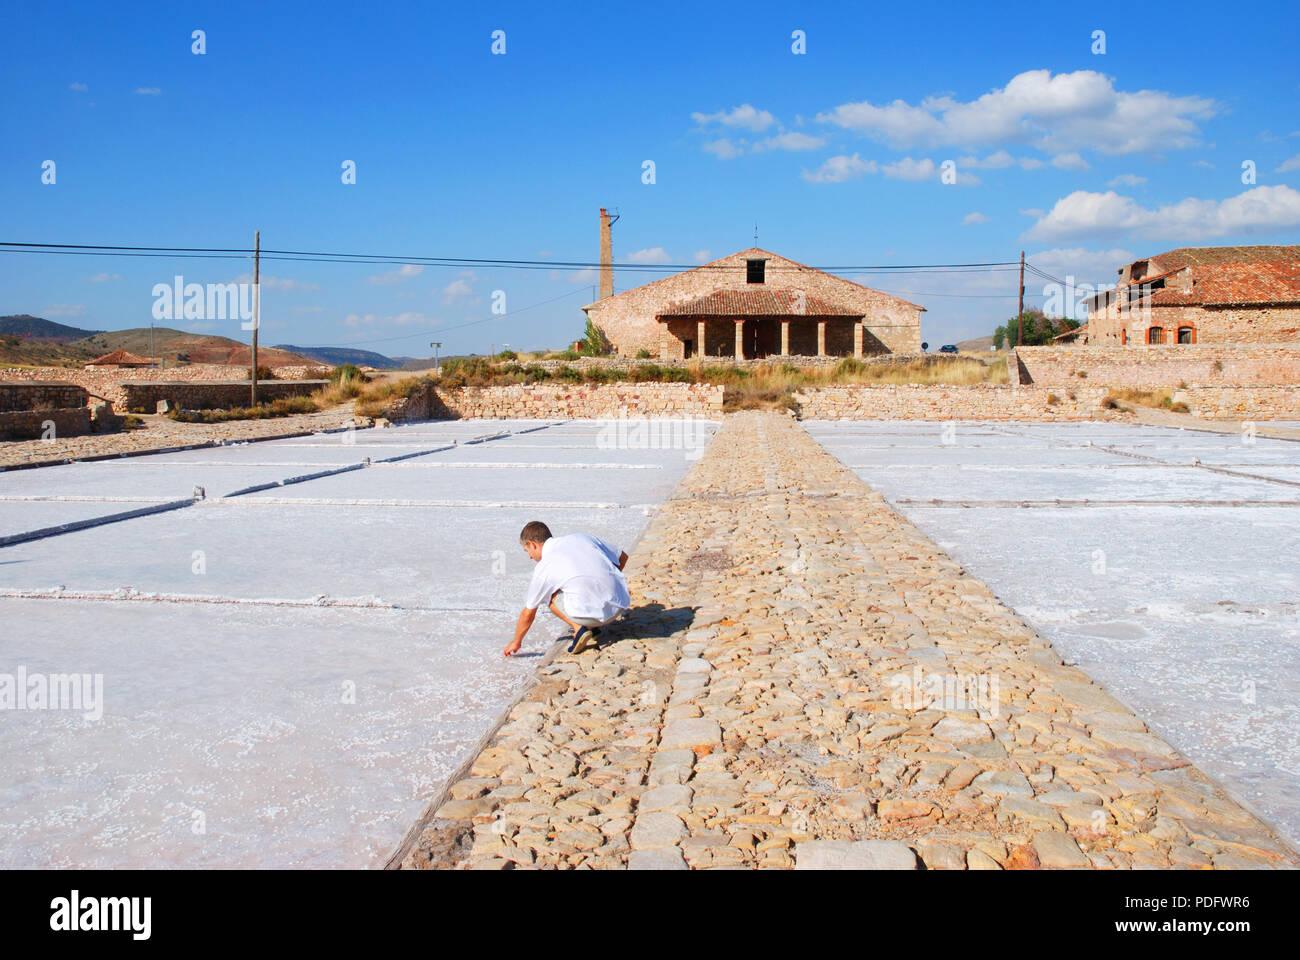 Man working at the saltworks. Imon, Guadalajara province, Castilla La Mancha, Spain. - Stock Image